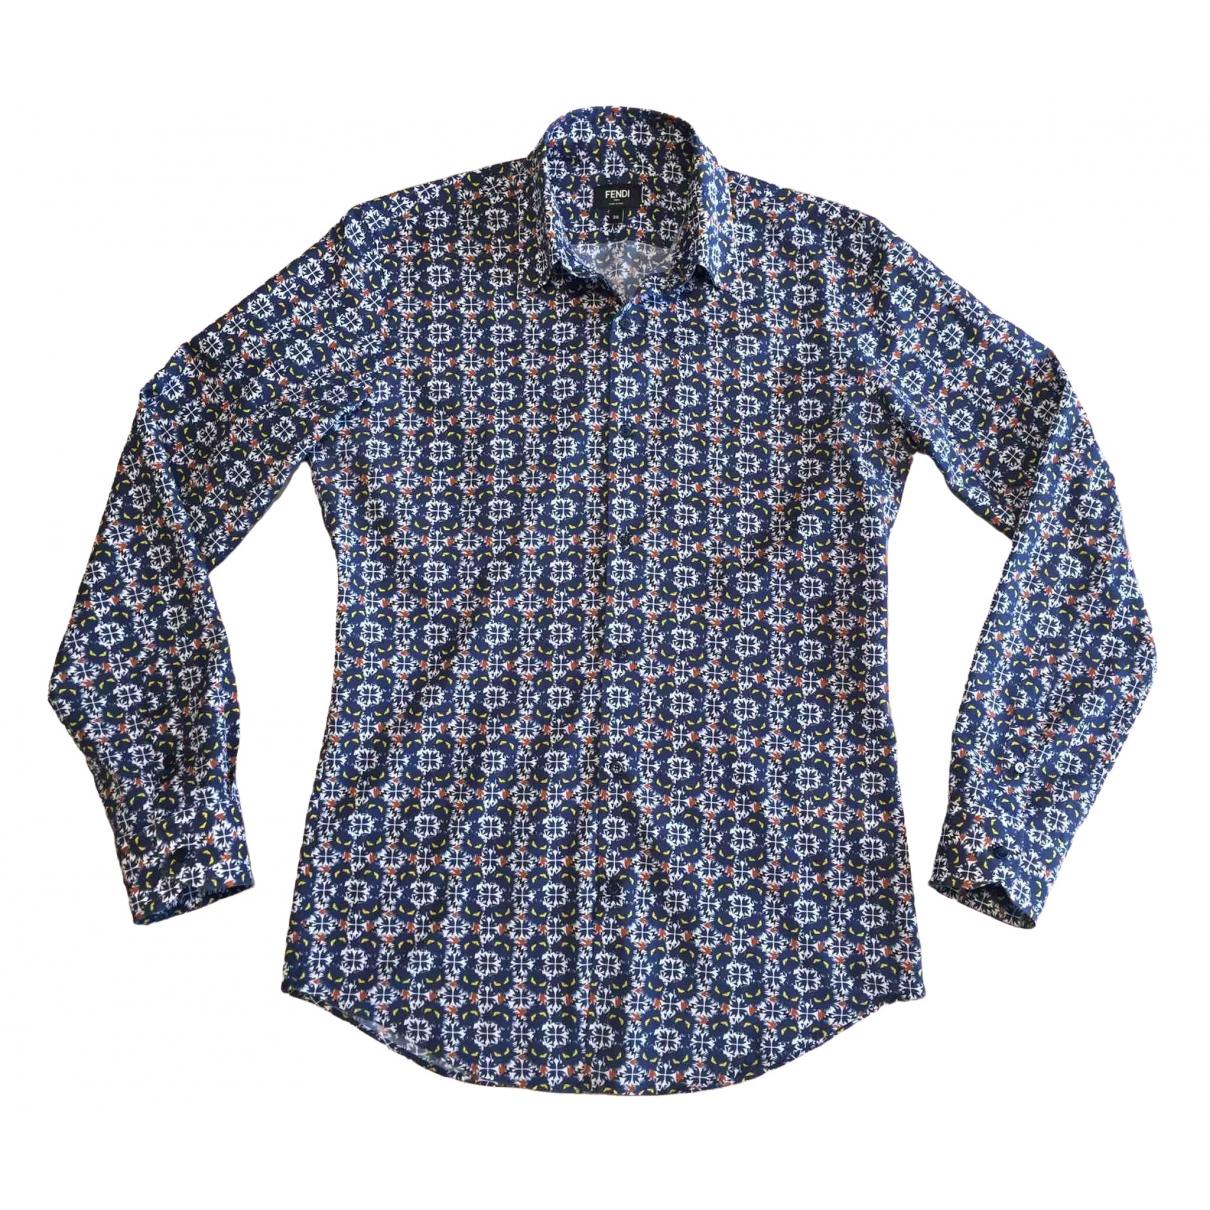 Fendi \N Blue Cotton Shirts for Men S International